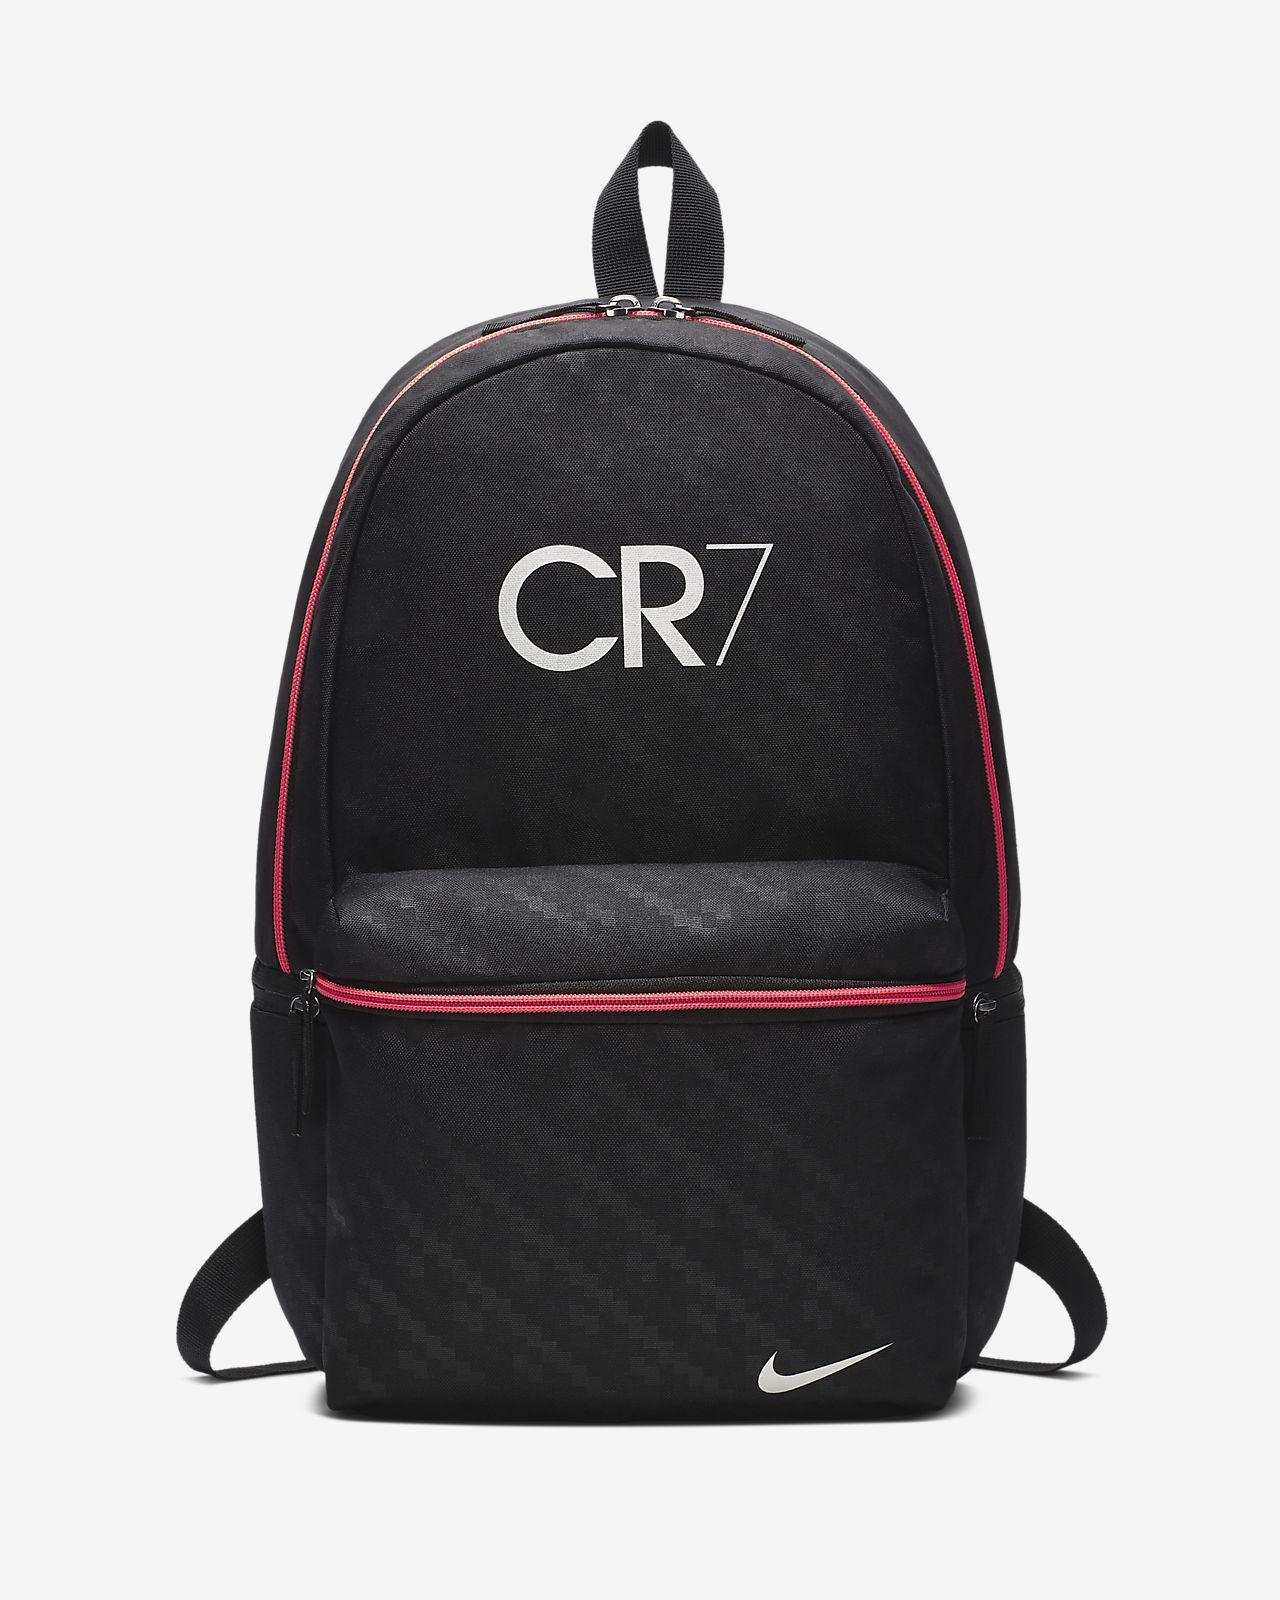 Ryggsäck CR7 för barn. Nike.com SE a83248d3c2d8f